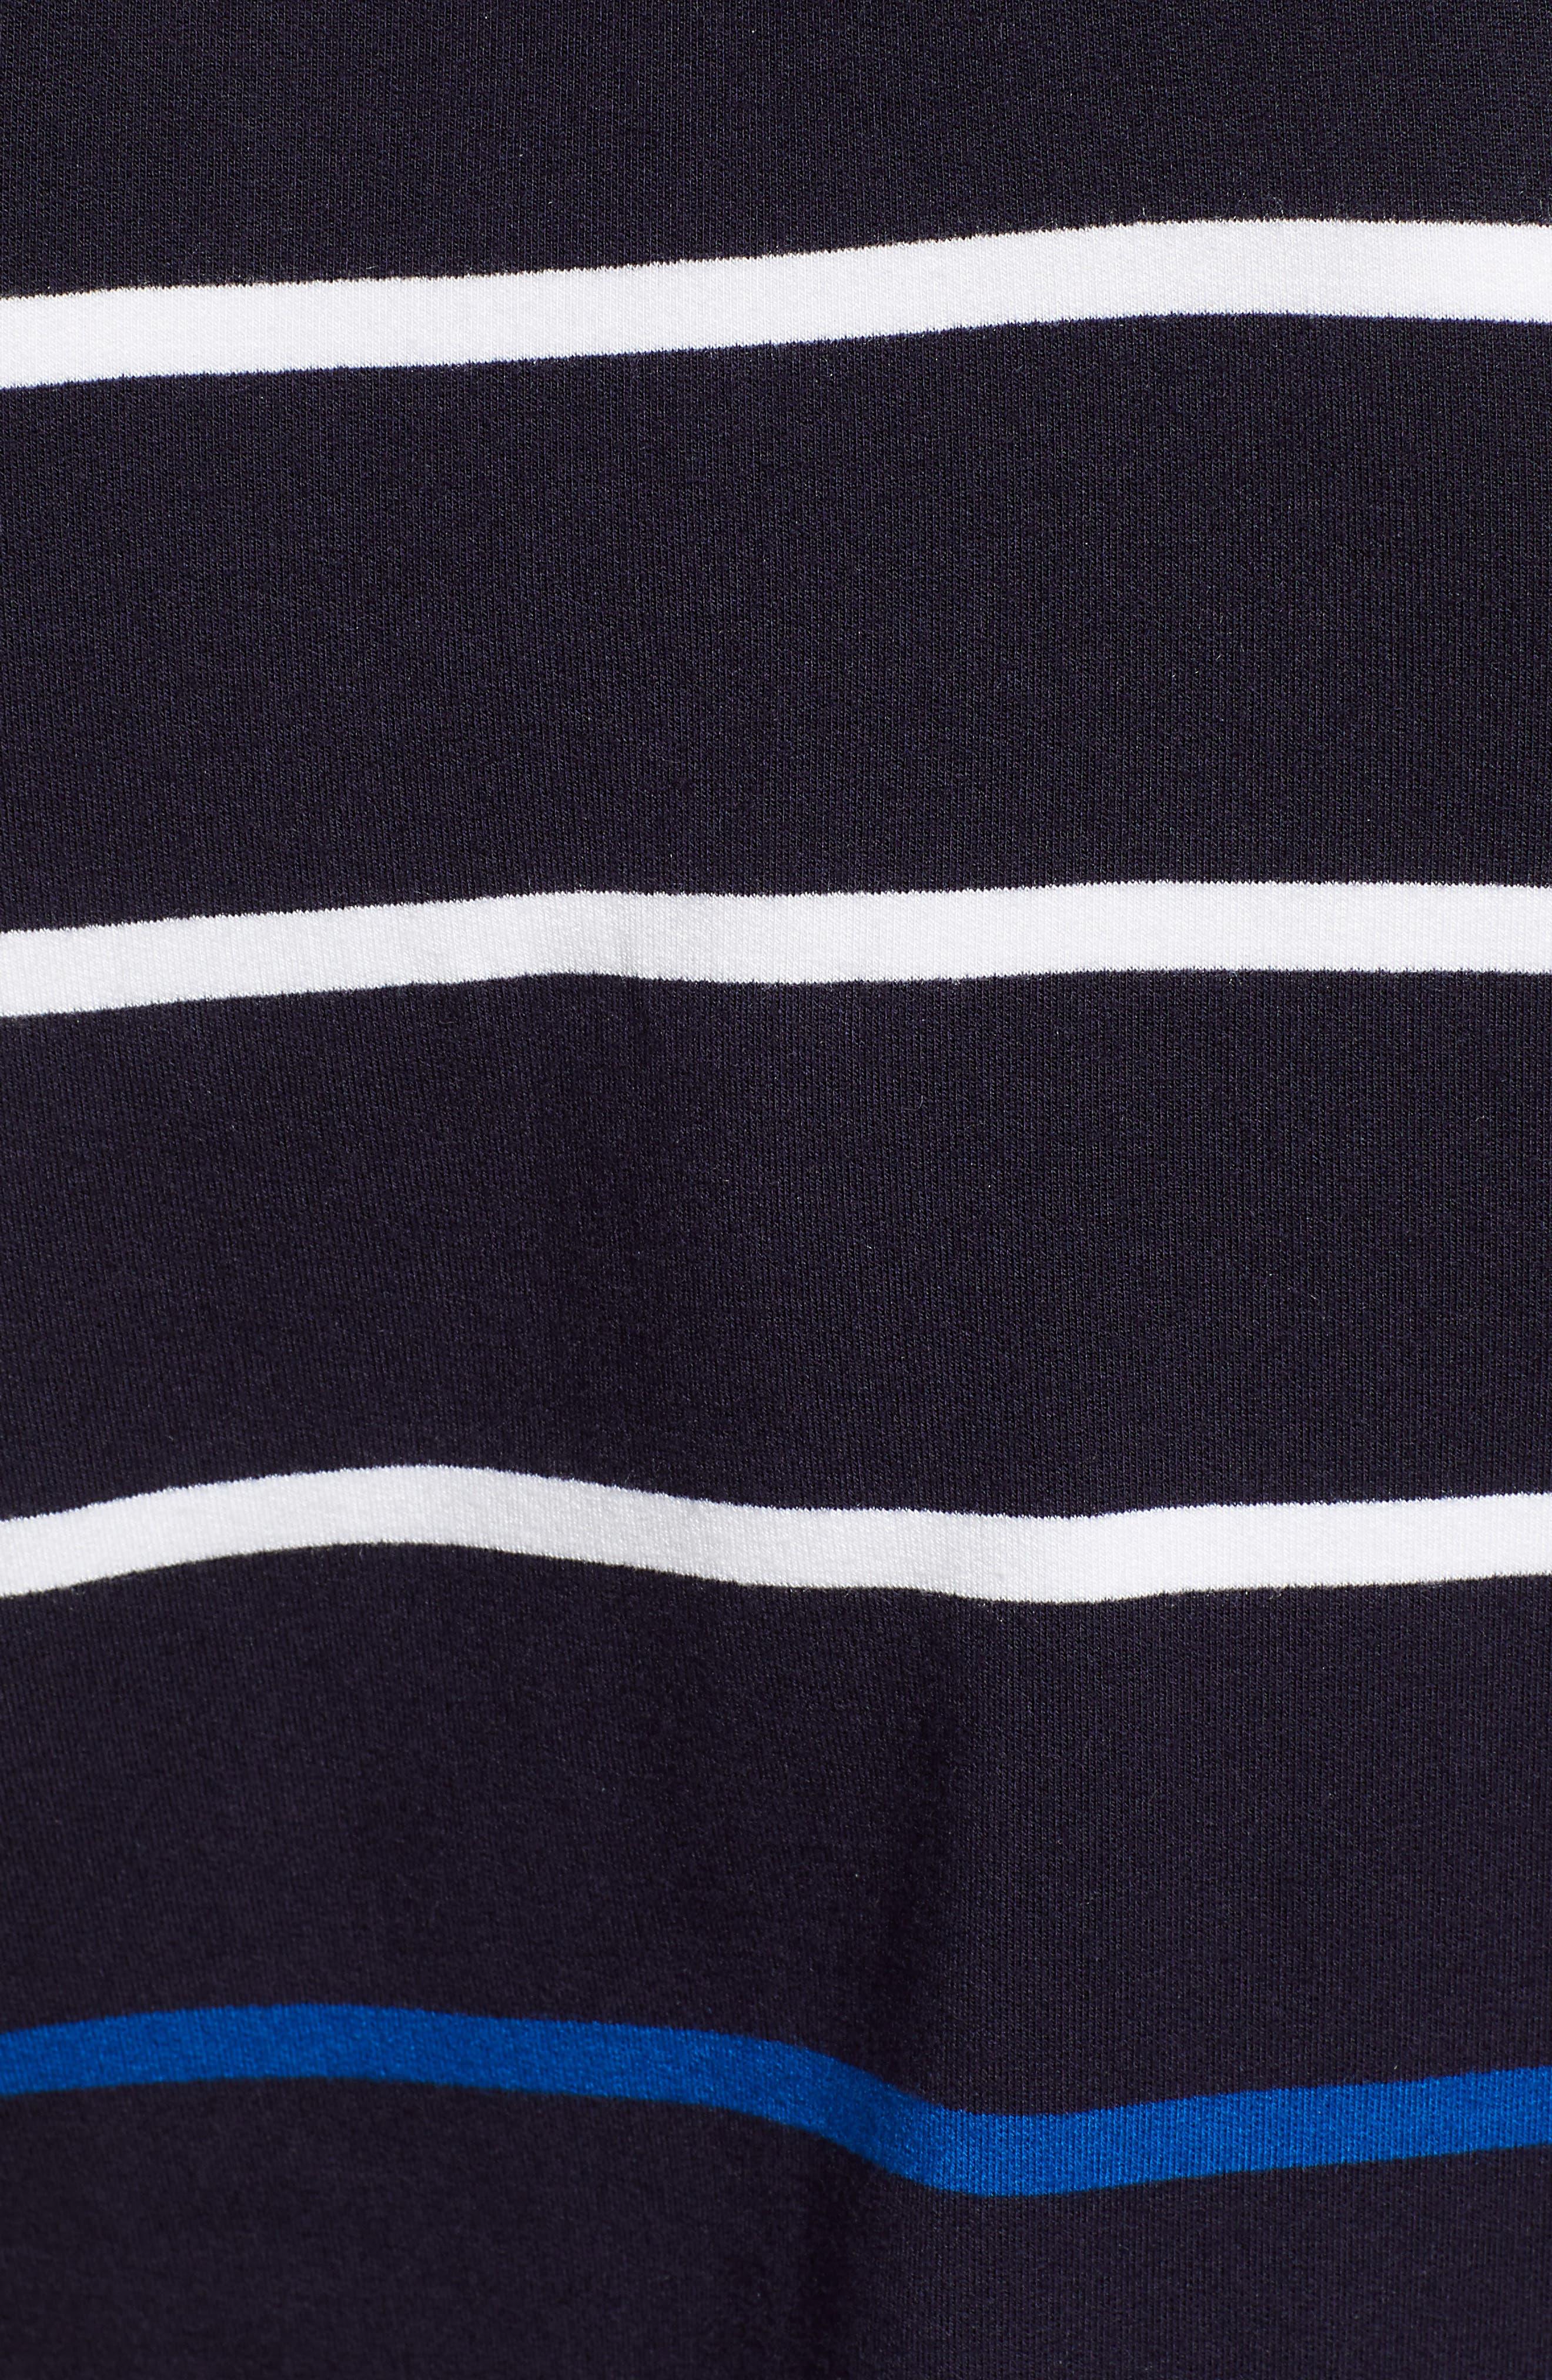 Colorblock Stripe Top,                             Alternate thumbnail 5, color,                             410